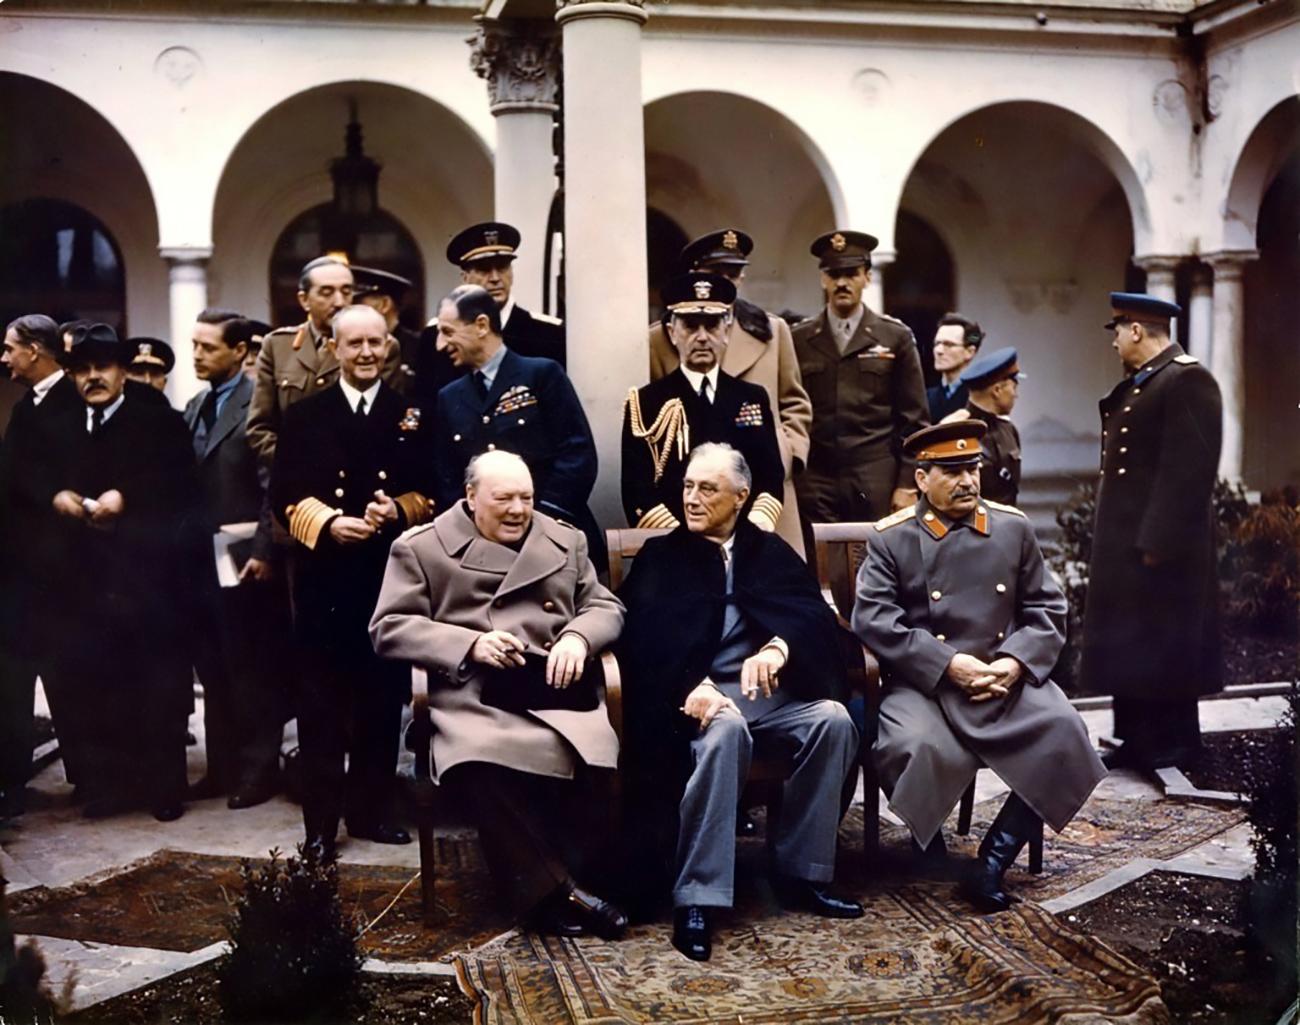 Yalta Conference 1945: Churchill, Stalin, Roosevelt. / Photo: Public domain